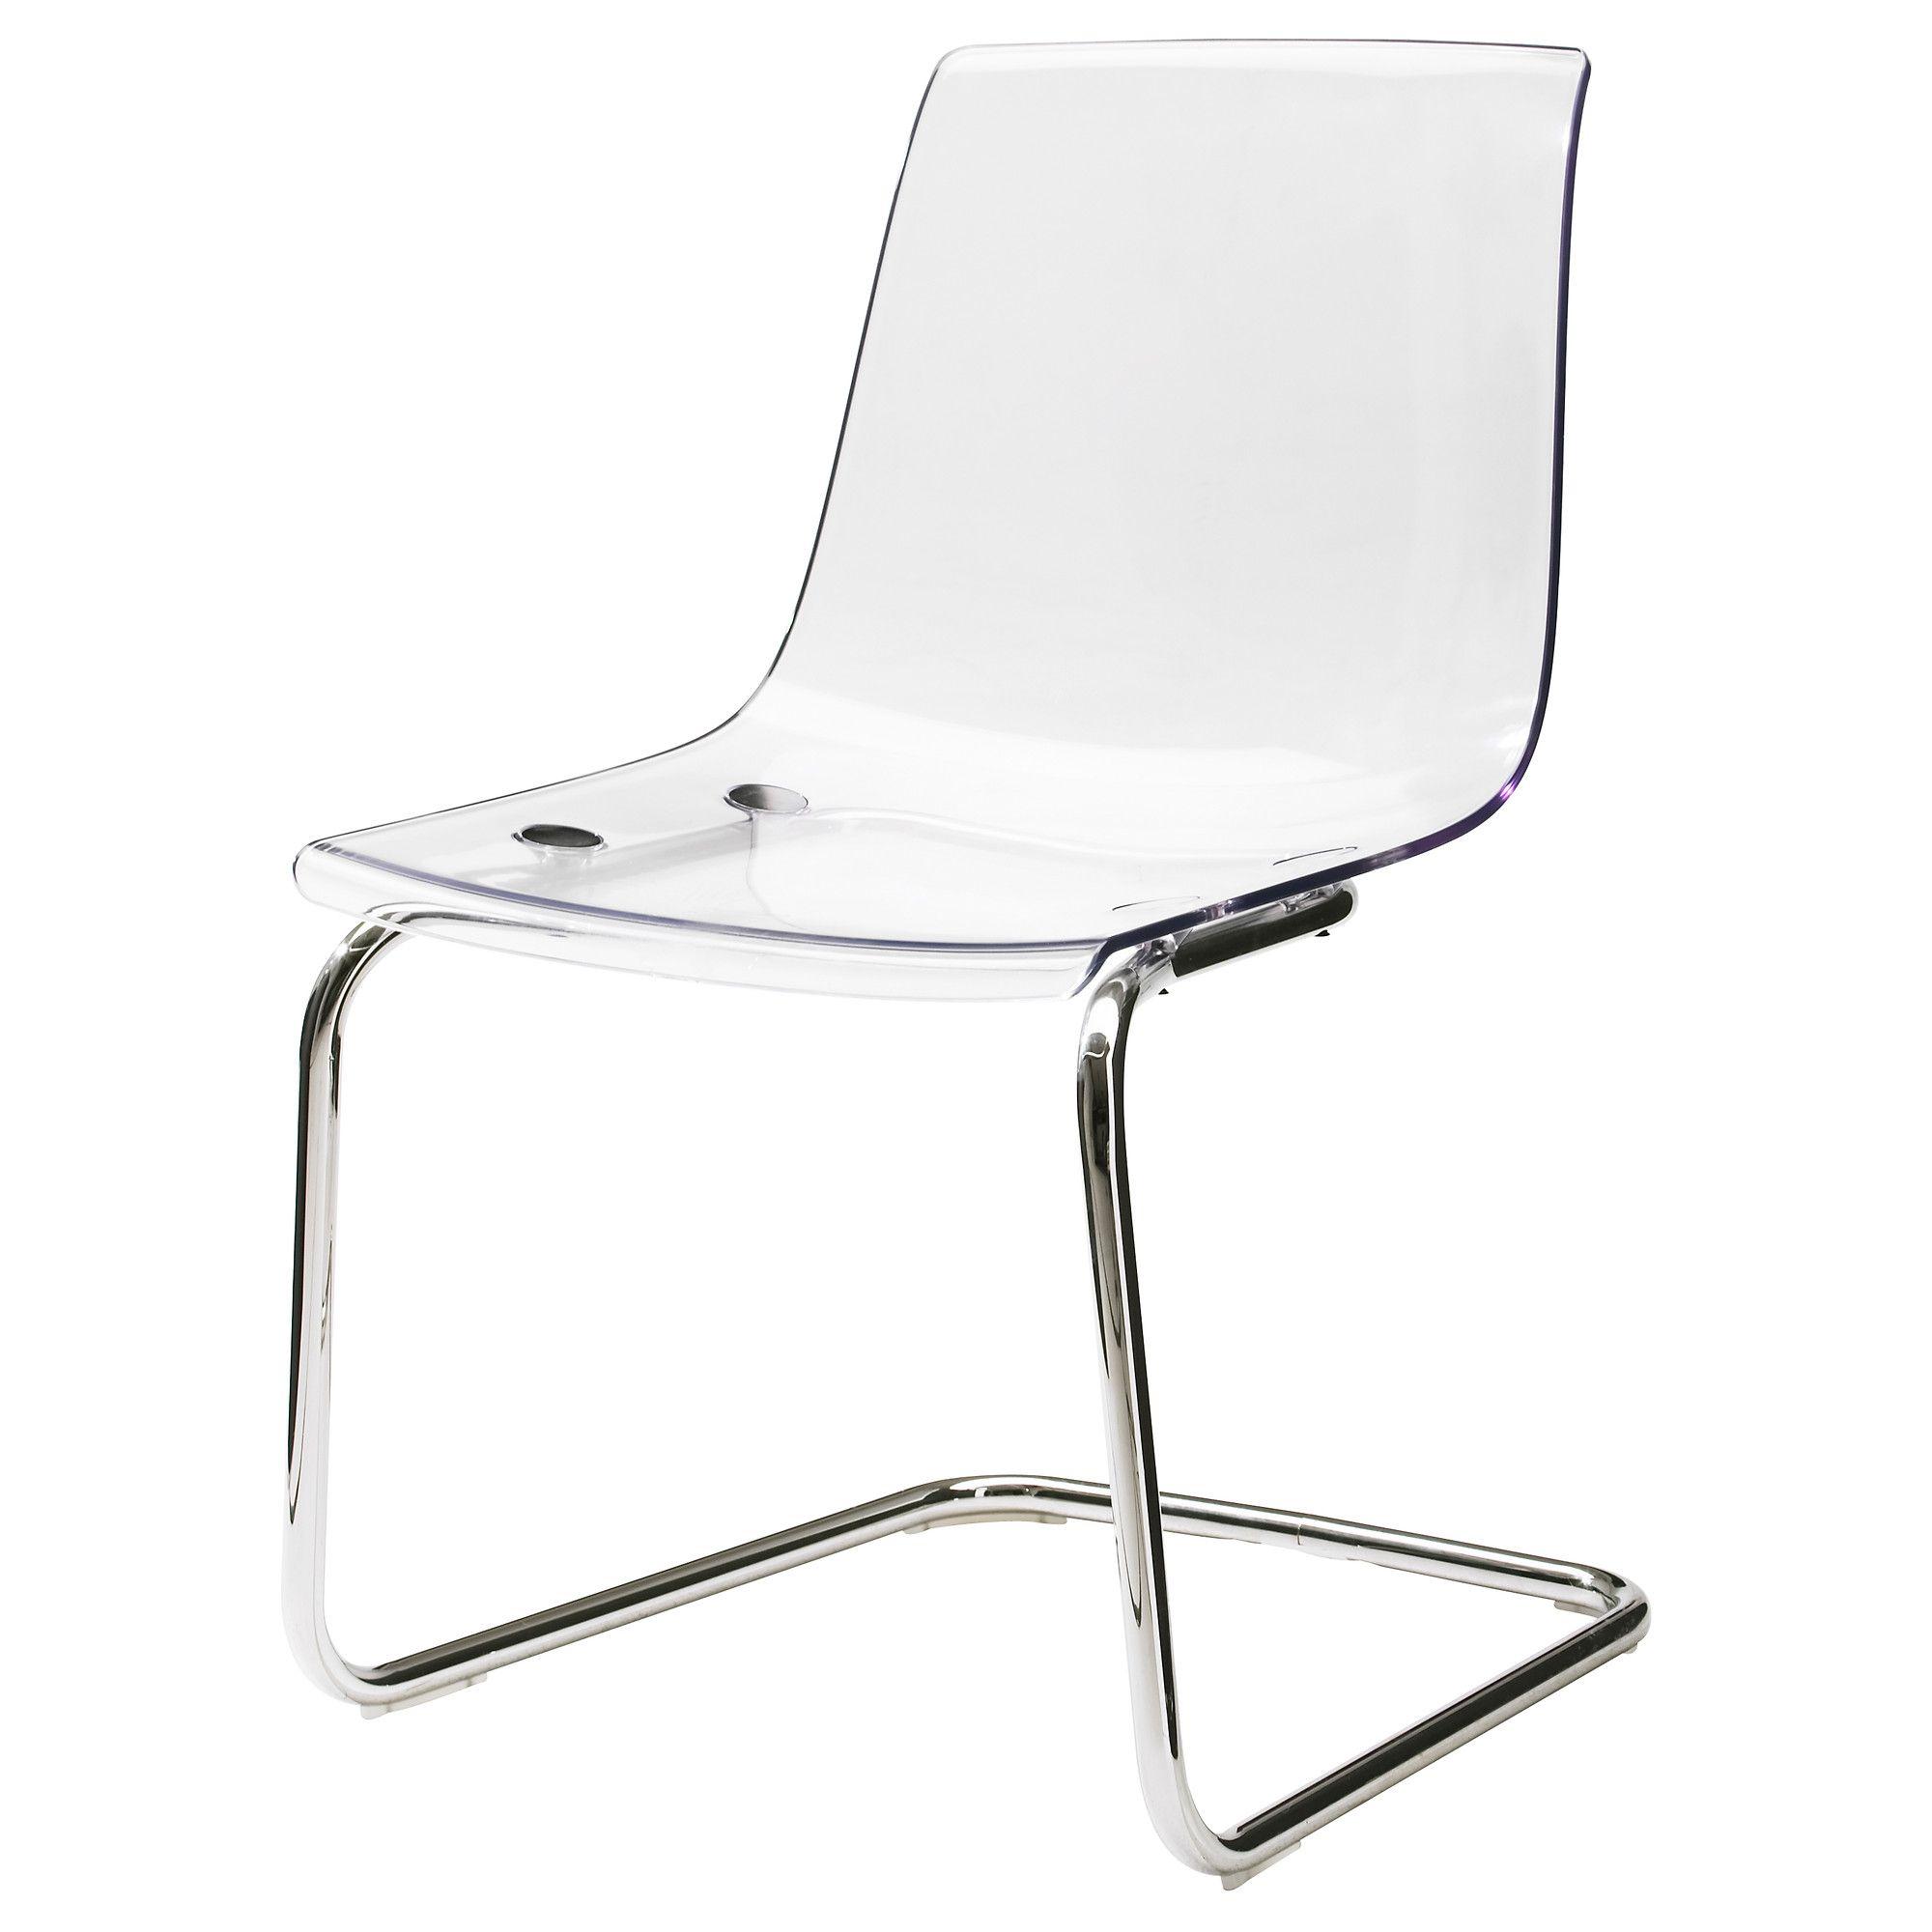 Ikea Us Furniture And Home Furnishings Acrylic Chair Acrylic